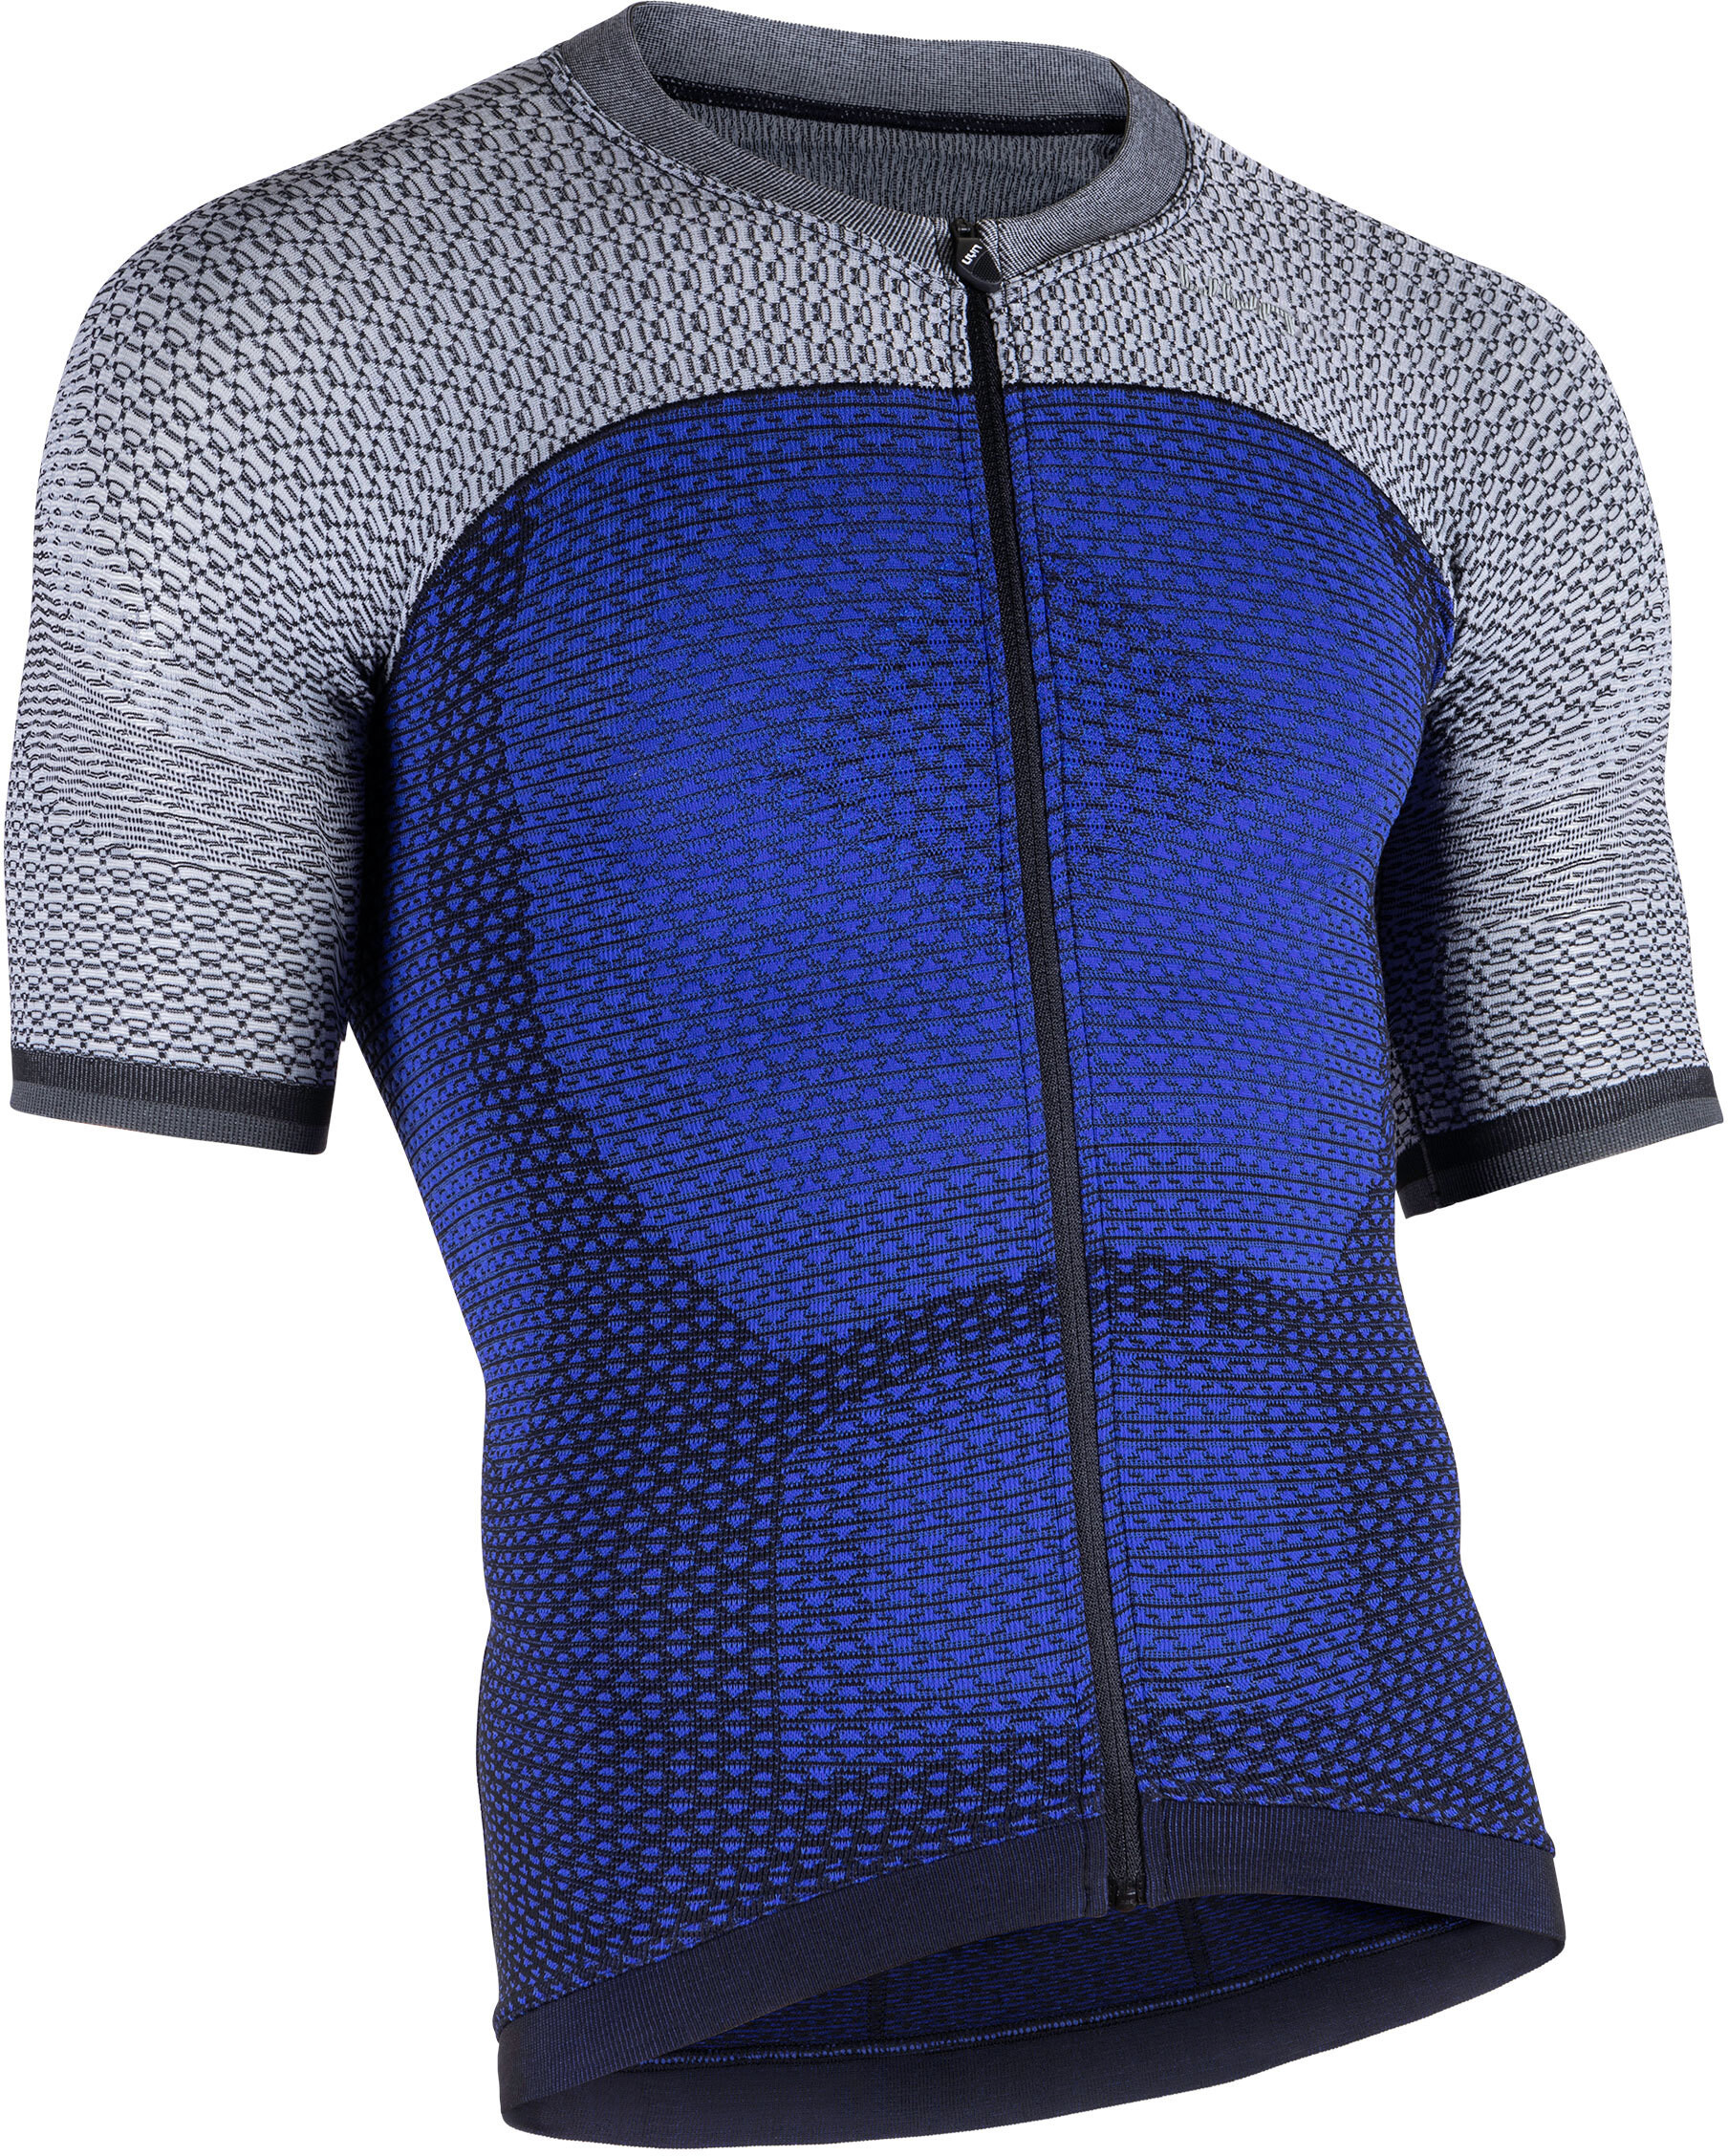 53407f5e5b33bc UYN Biking Alpha OW maglietta a maniche corte Uomo, medieval blue/sleet grey